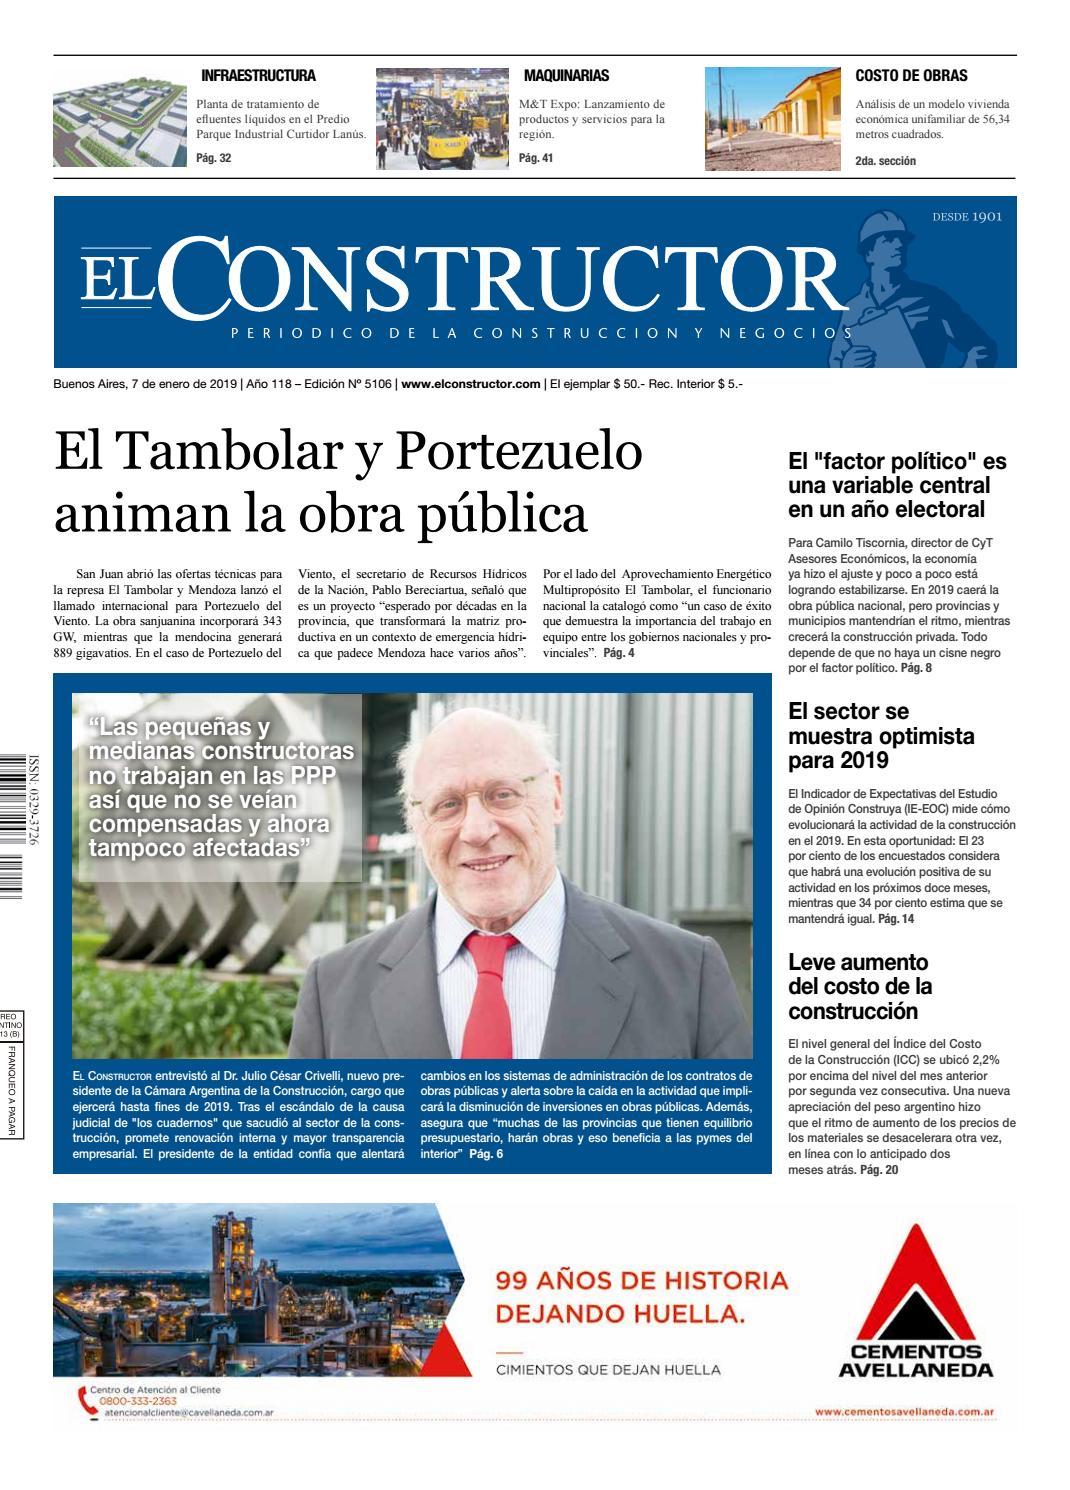 b156d9e6e39 El Constructor 7/1/19 - N° 5106 Año 118 by ELCO Editores - issuu